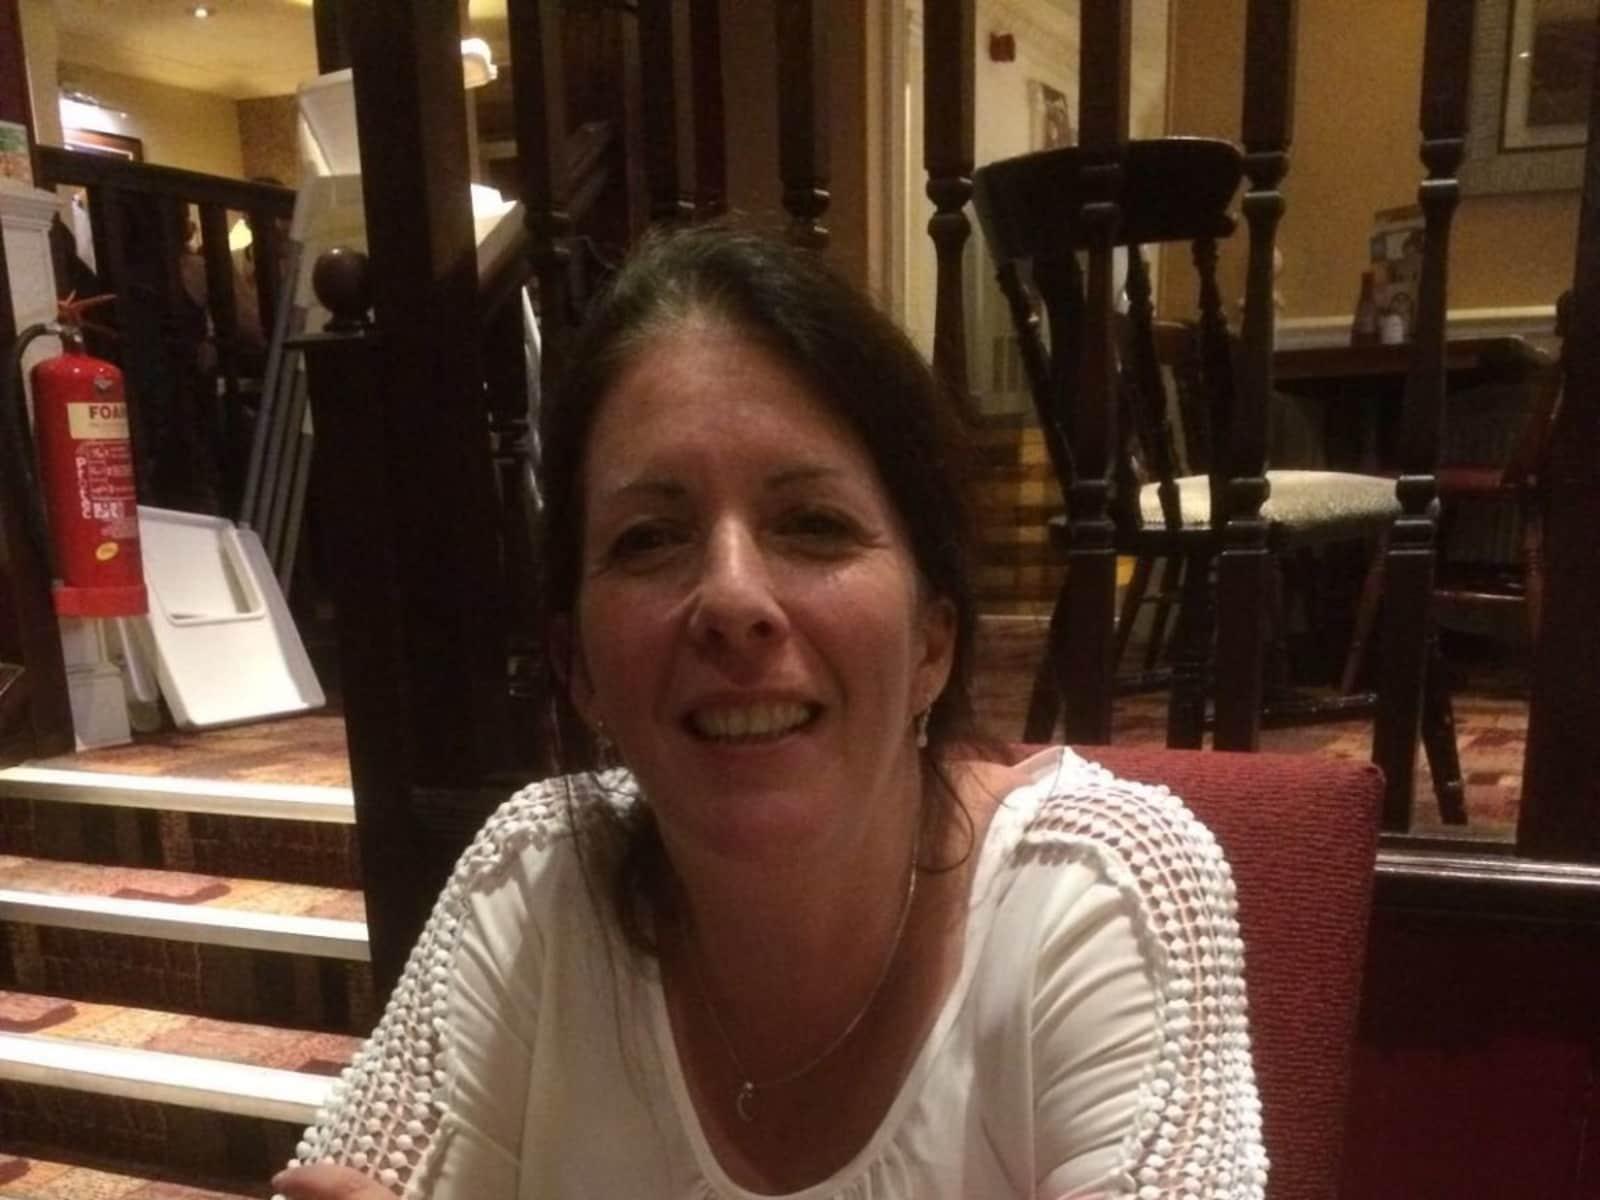 Christine from Manchester, United Kingdom